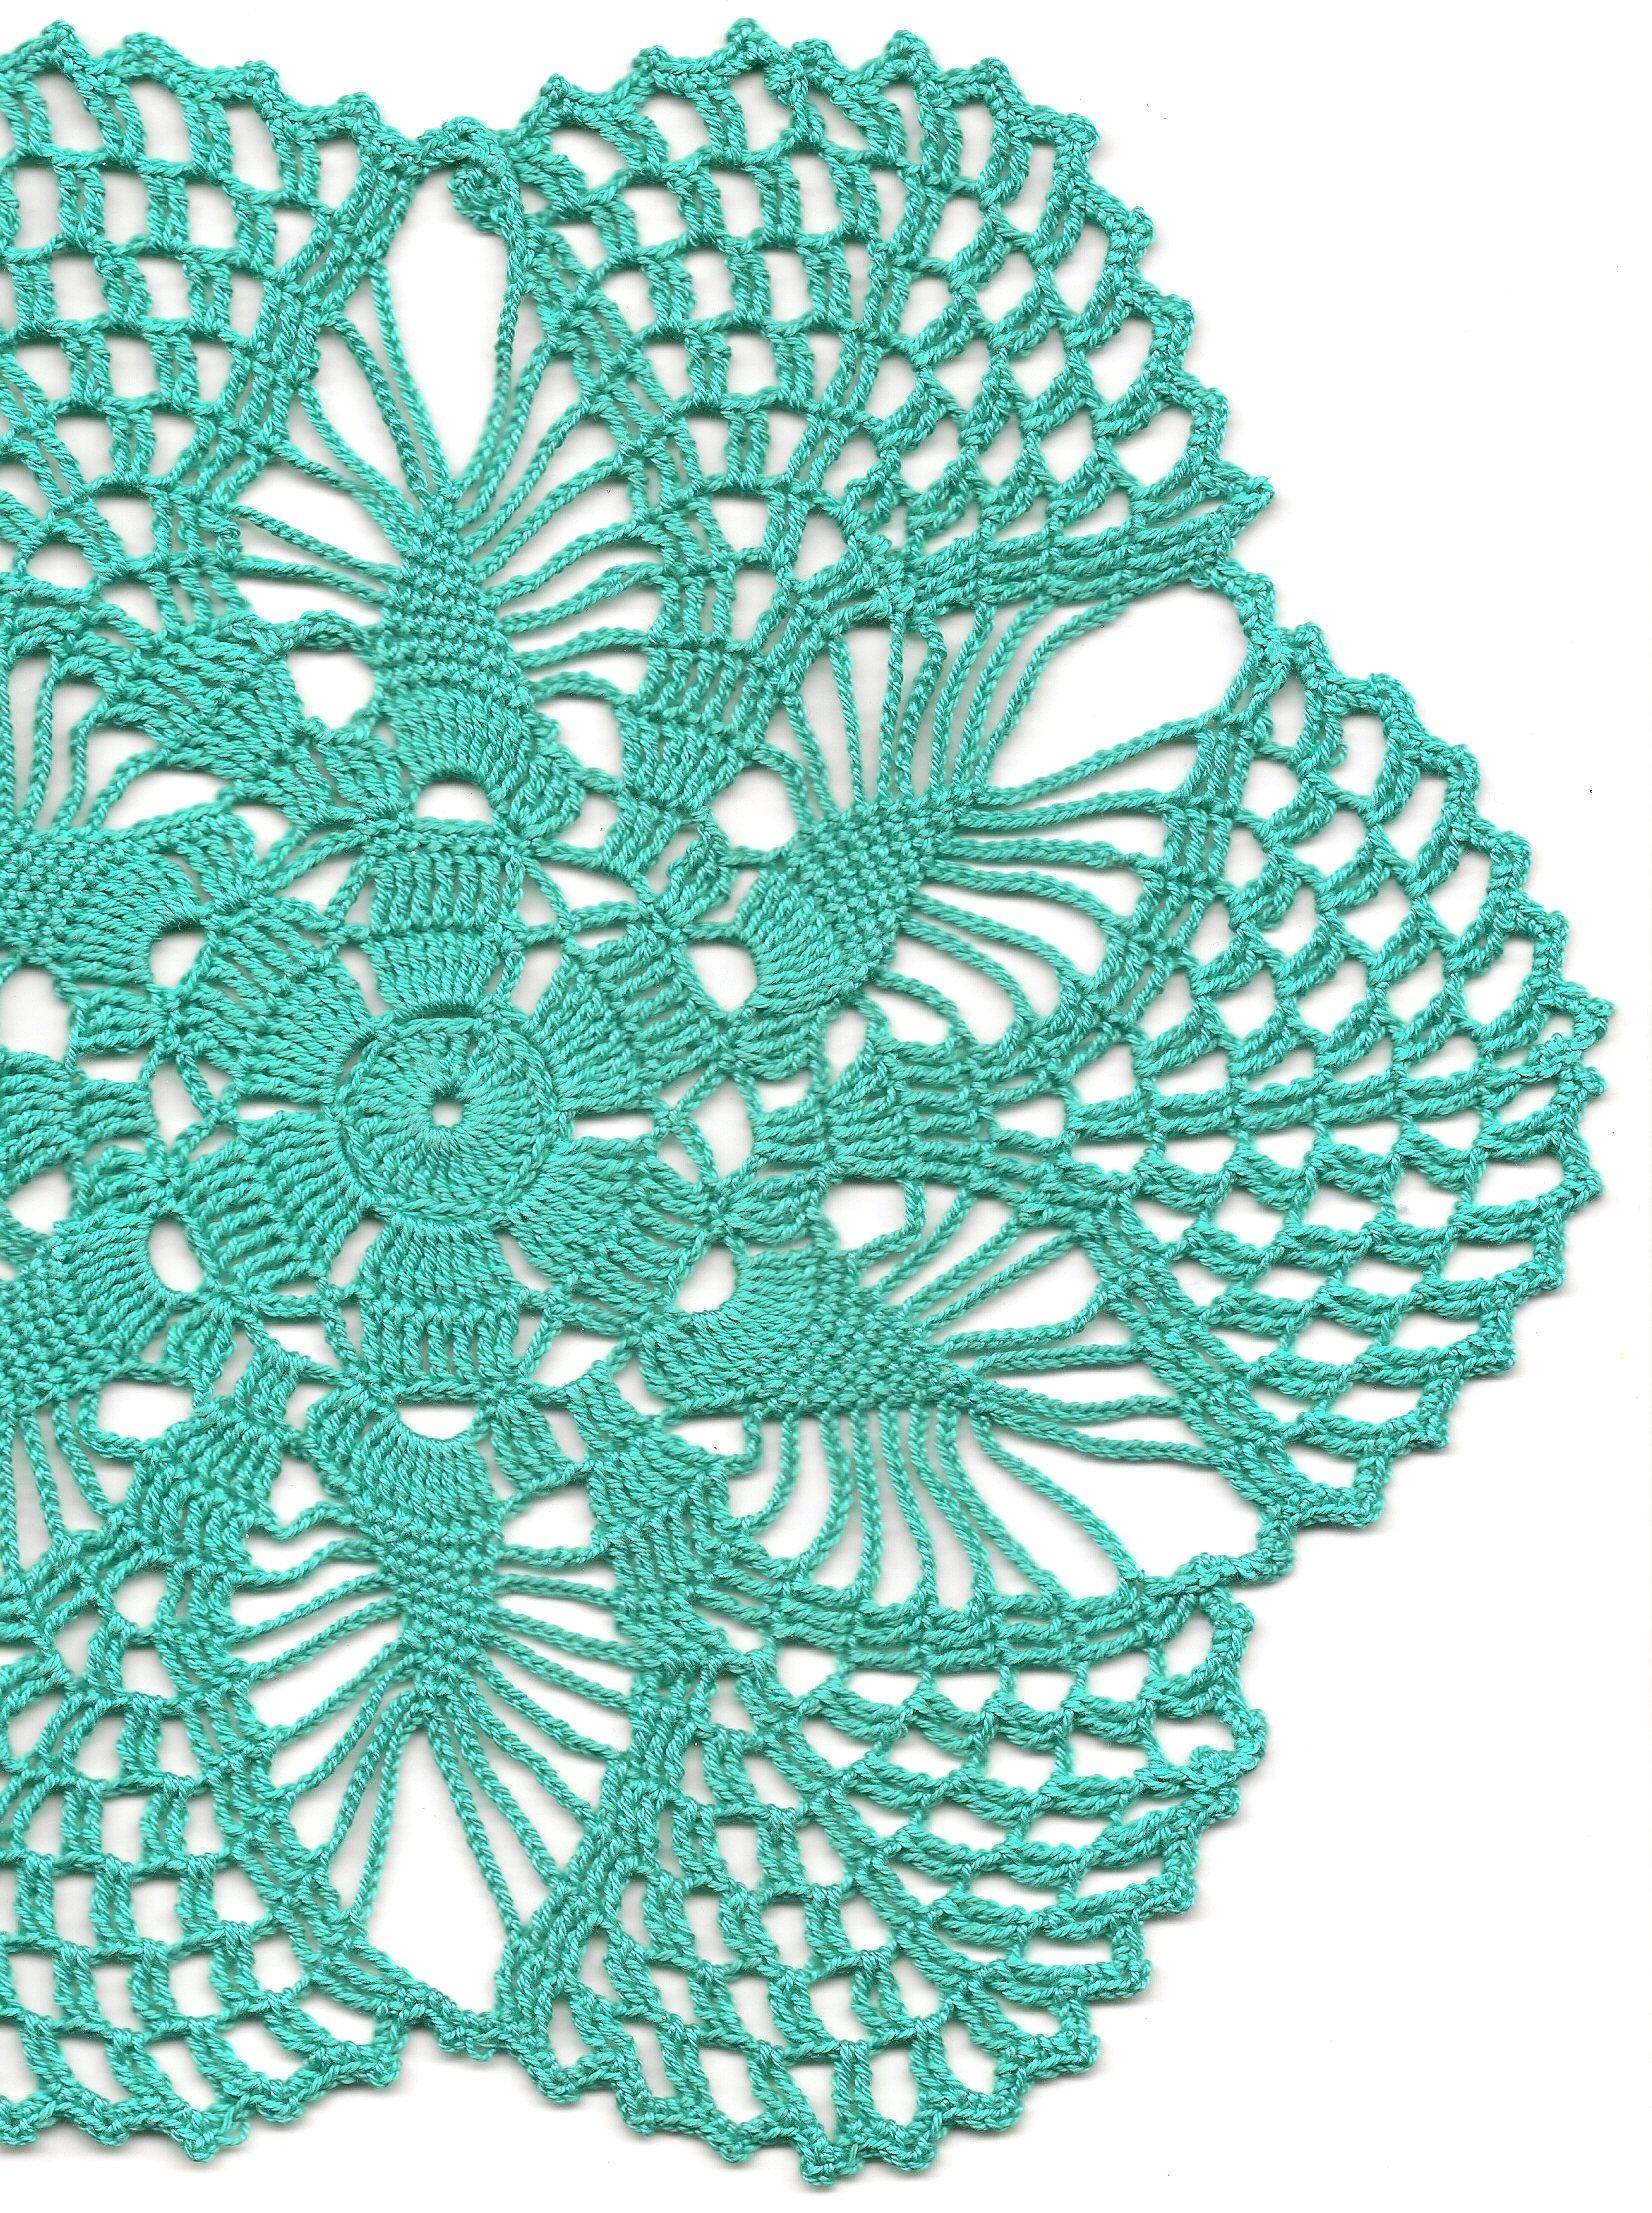 Vintage Handmade Crochet Doily Lace Lacy Doilies Wedding Decoration Home Decor Flower Mandala Dream Catcher Crocheted Round Mint